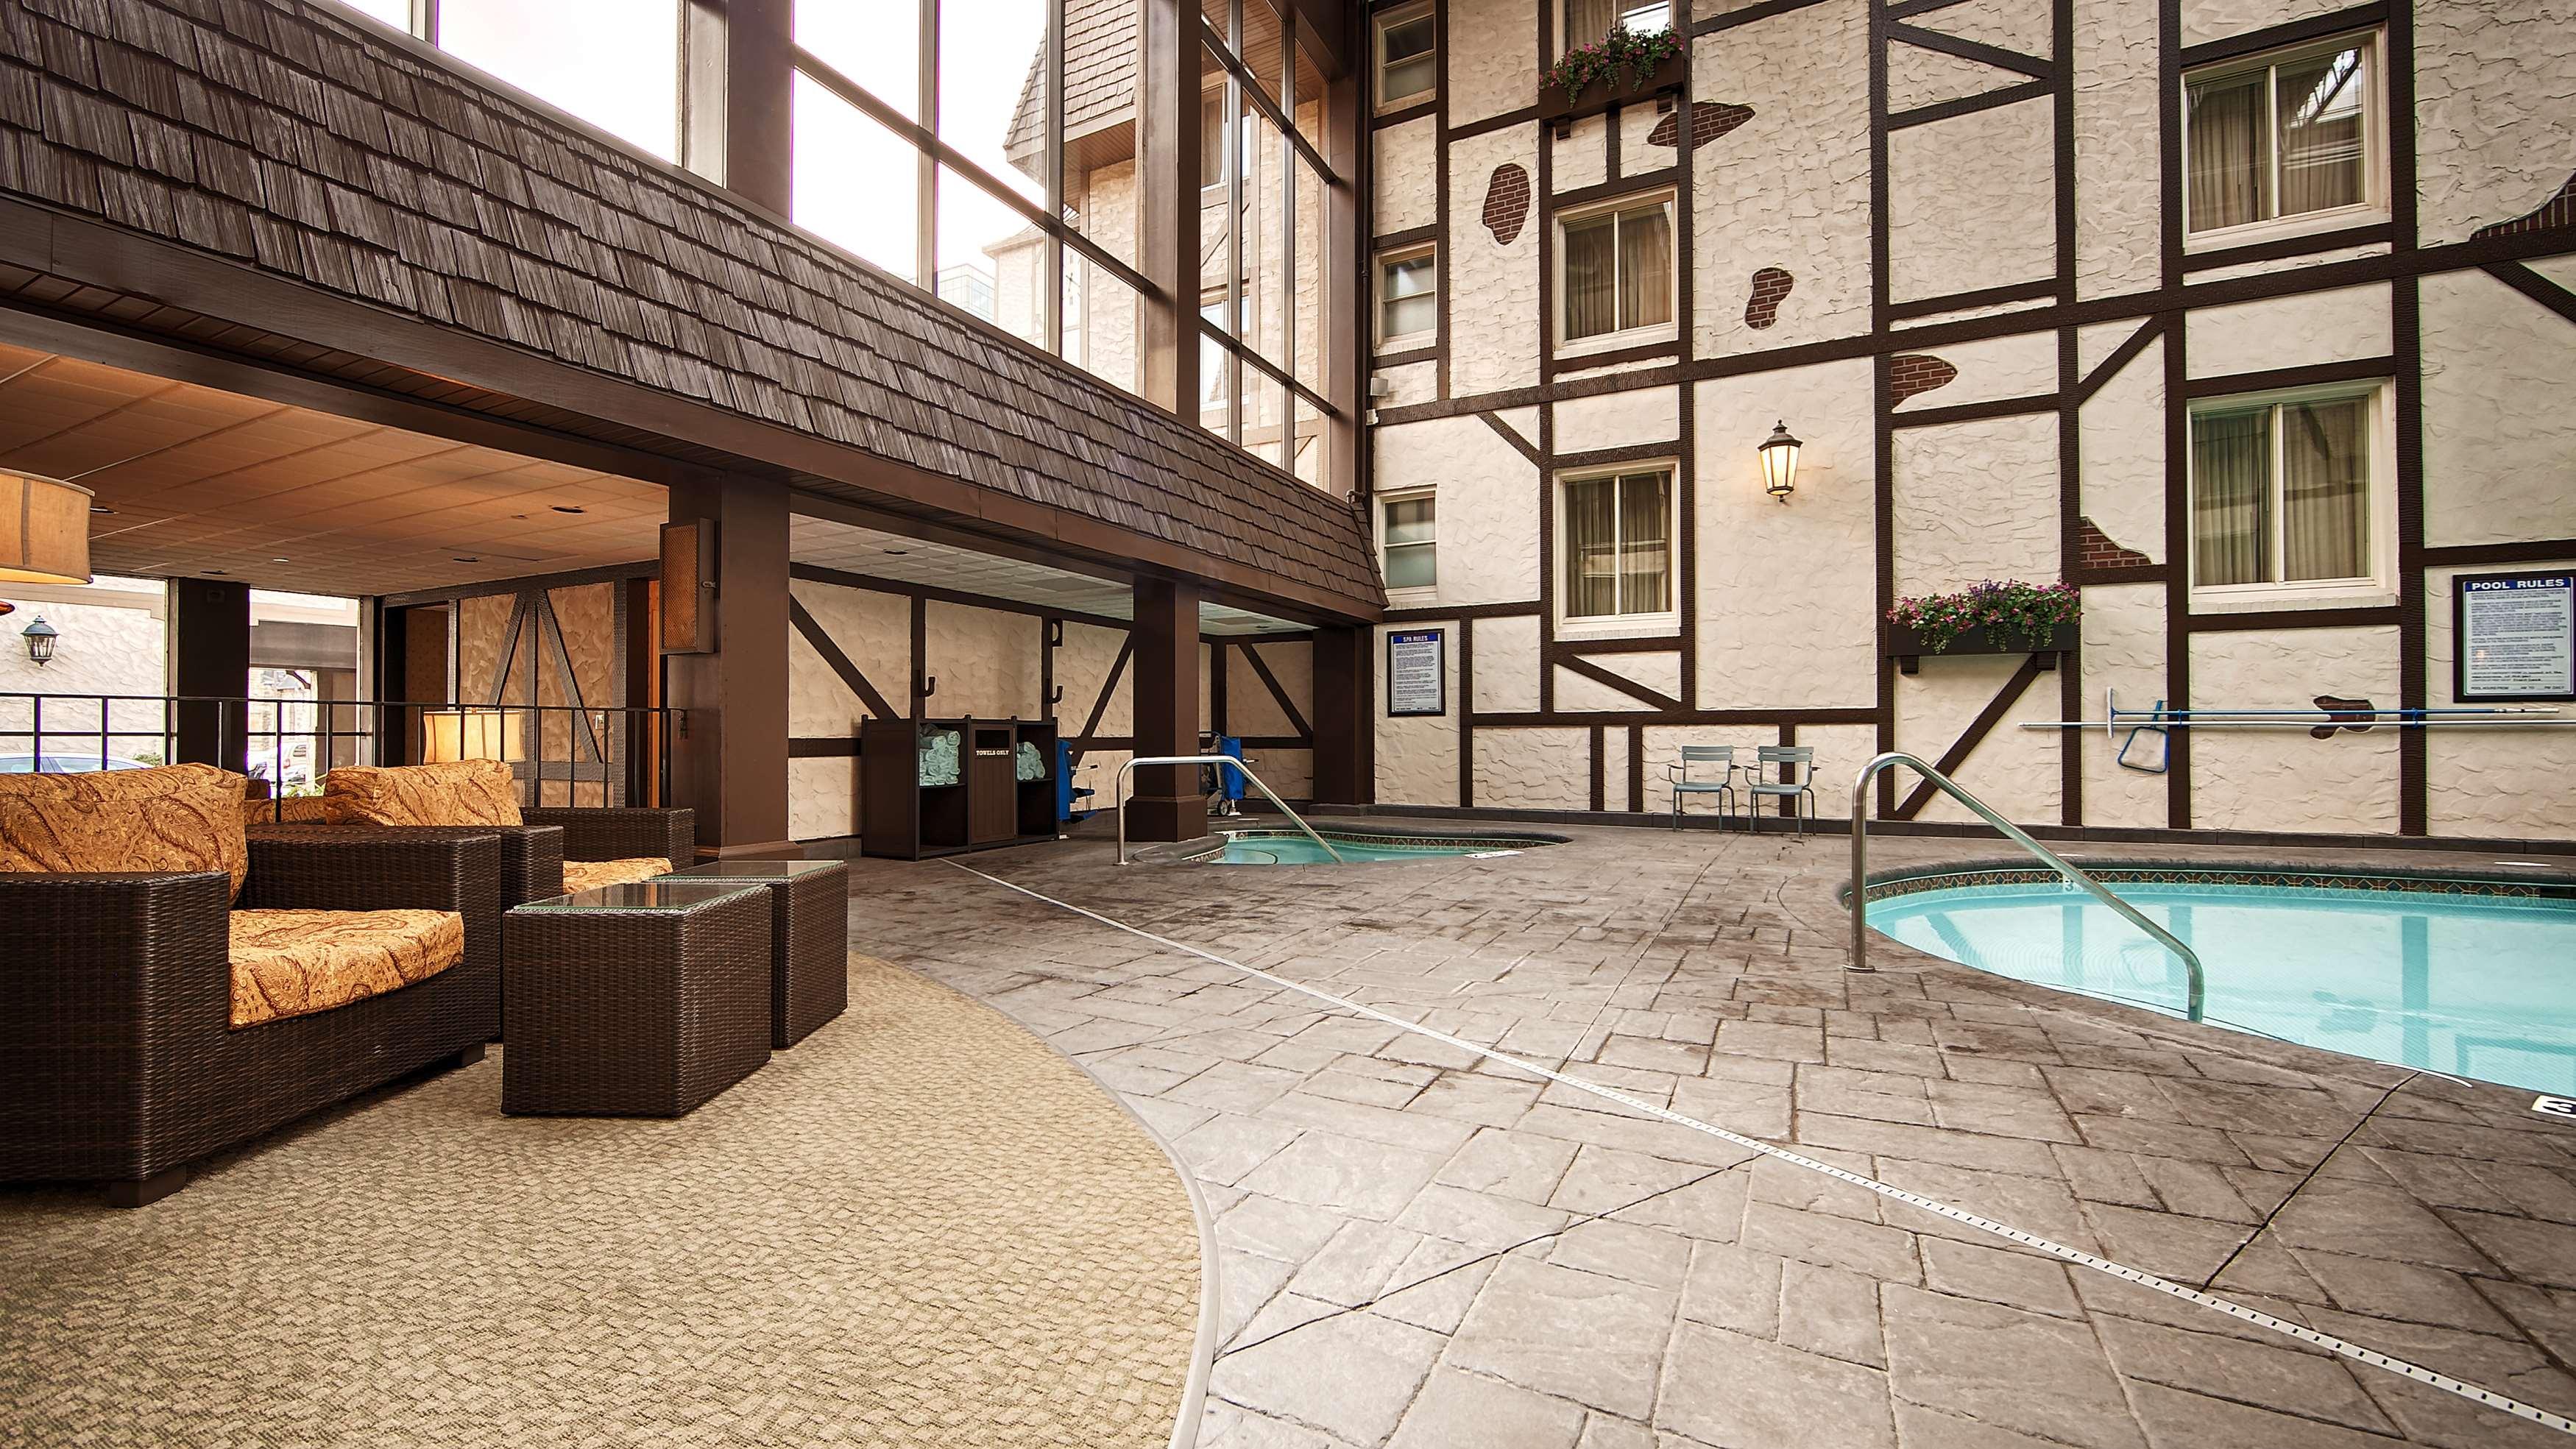 Best Western Plus The Normandy Inn & Suites image 15